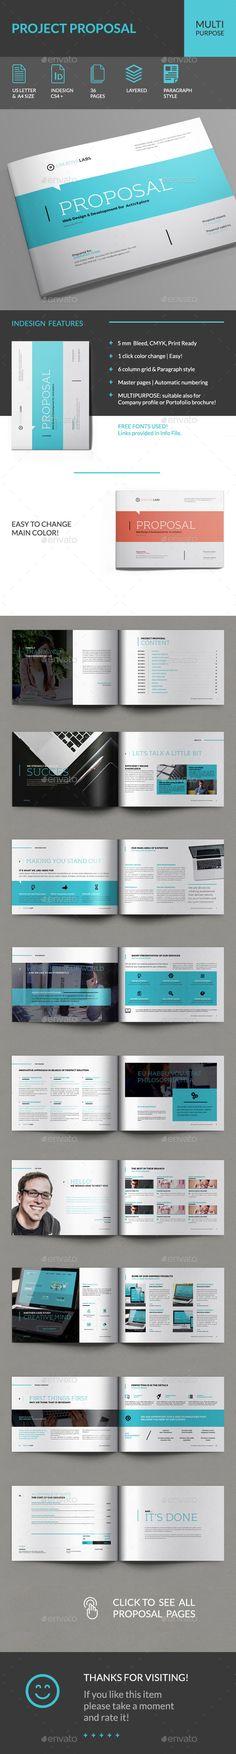 Proposal Template InDesign INDD #design Download…